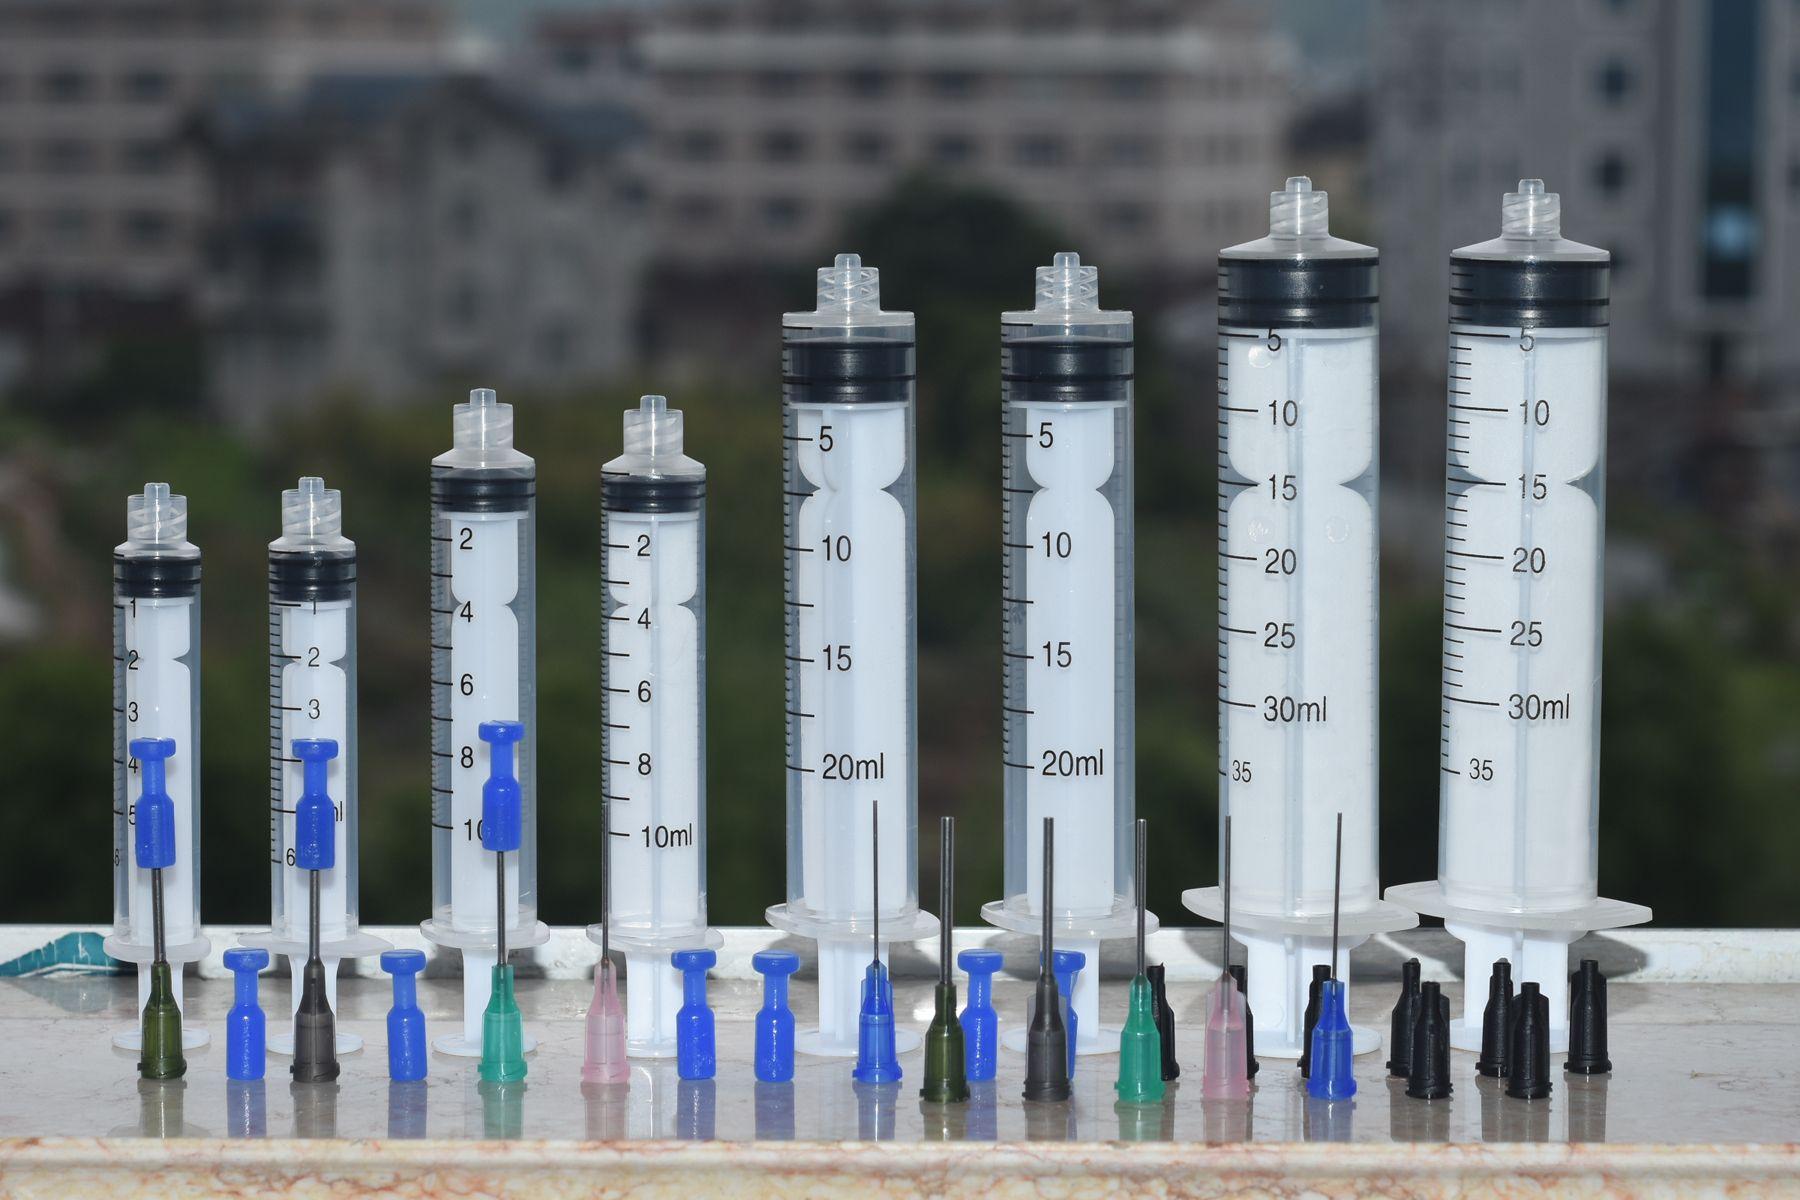 30cc 20cc 10CC 5CC Syringe Blunt Tip Needle and Storage Caps, Great for Refilling E-juice E-Liquids, E-cigs, Vape, Oil or Glue Applicator